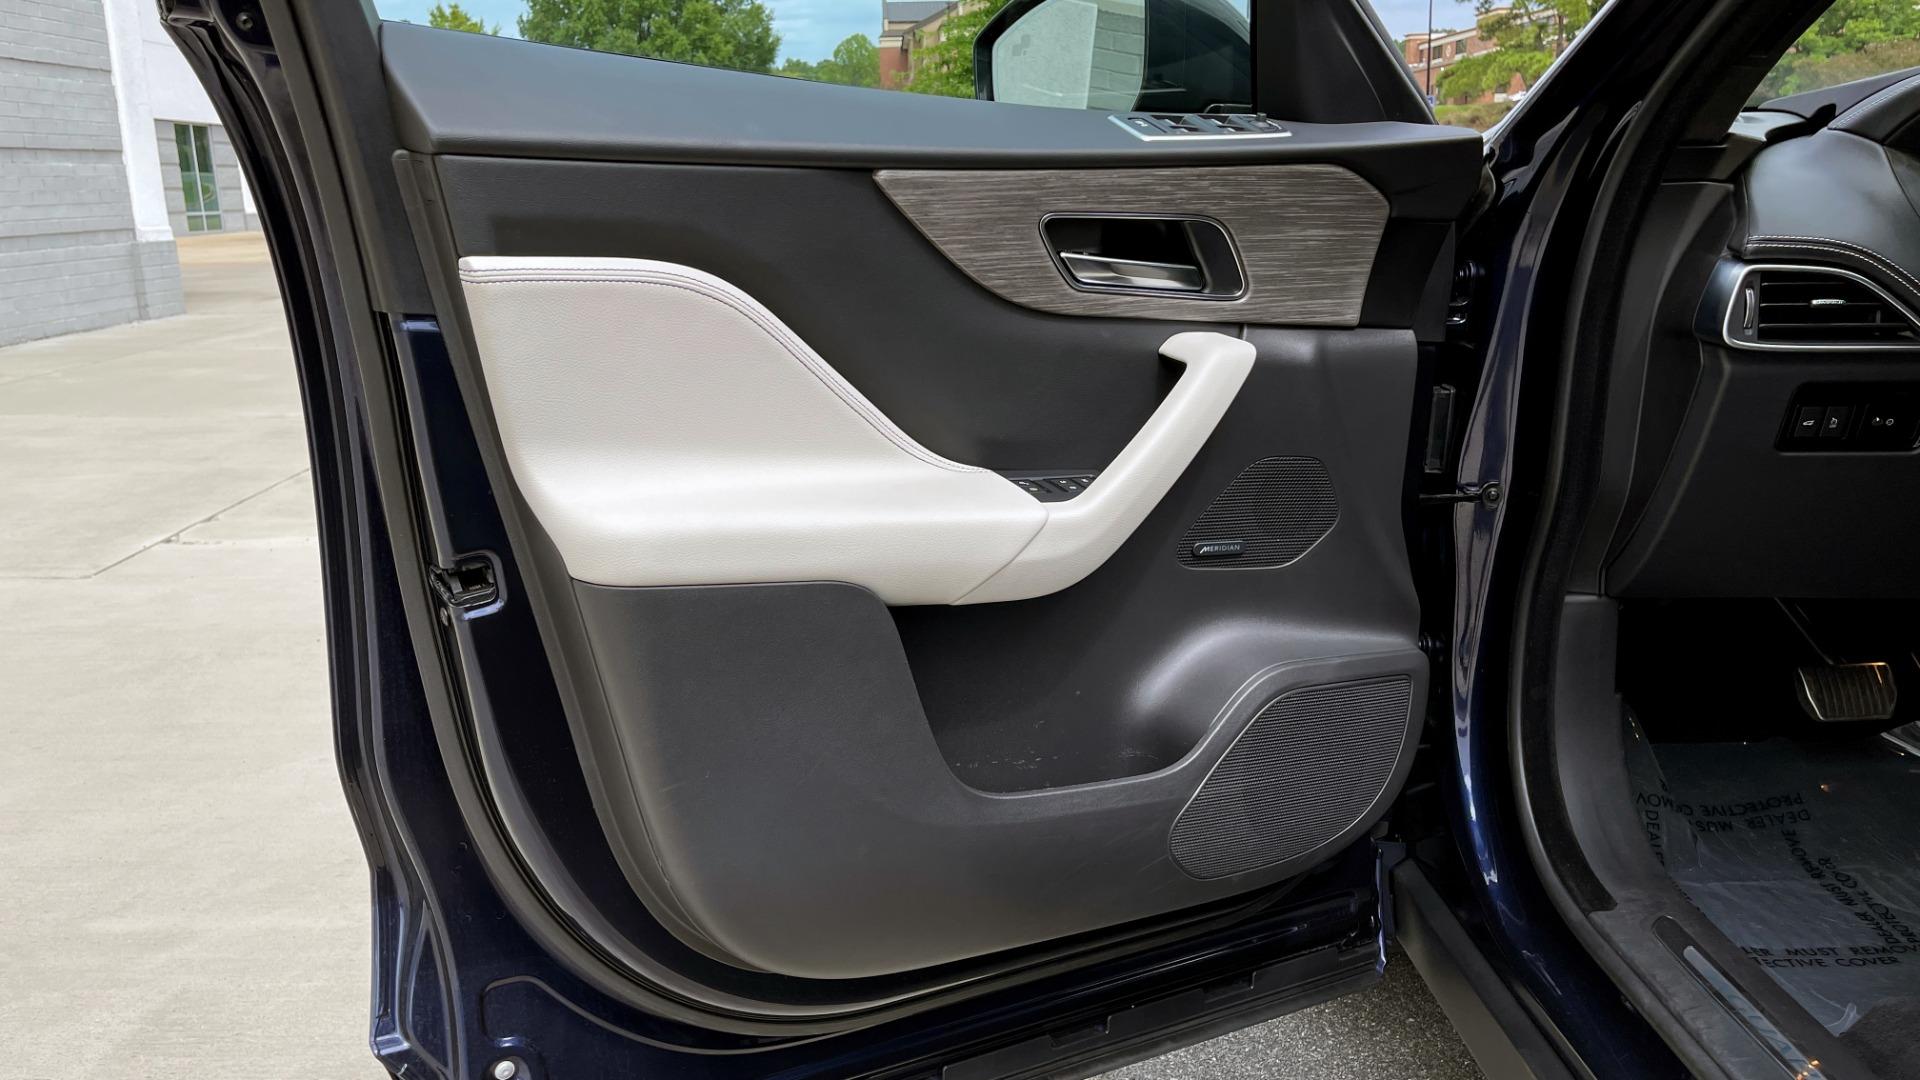 Used 2019 Jaguar F-PACE S / DRIVE PKG / BSA / HUD / BLACK EXT PKG / REARVIEW for sale $50,995 at Formula Imports in Charlotte NC 28227 25